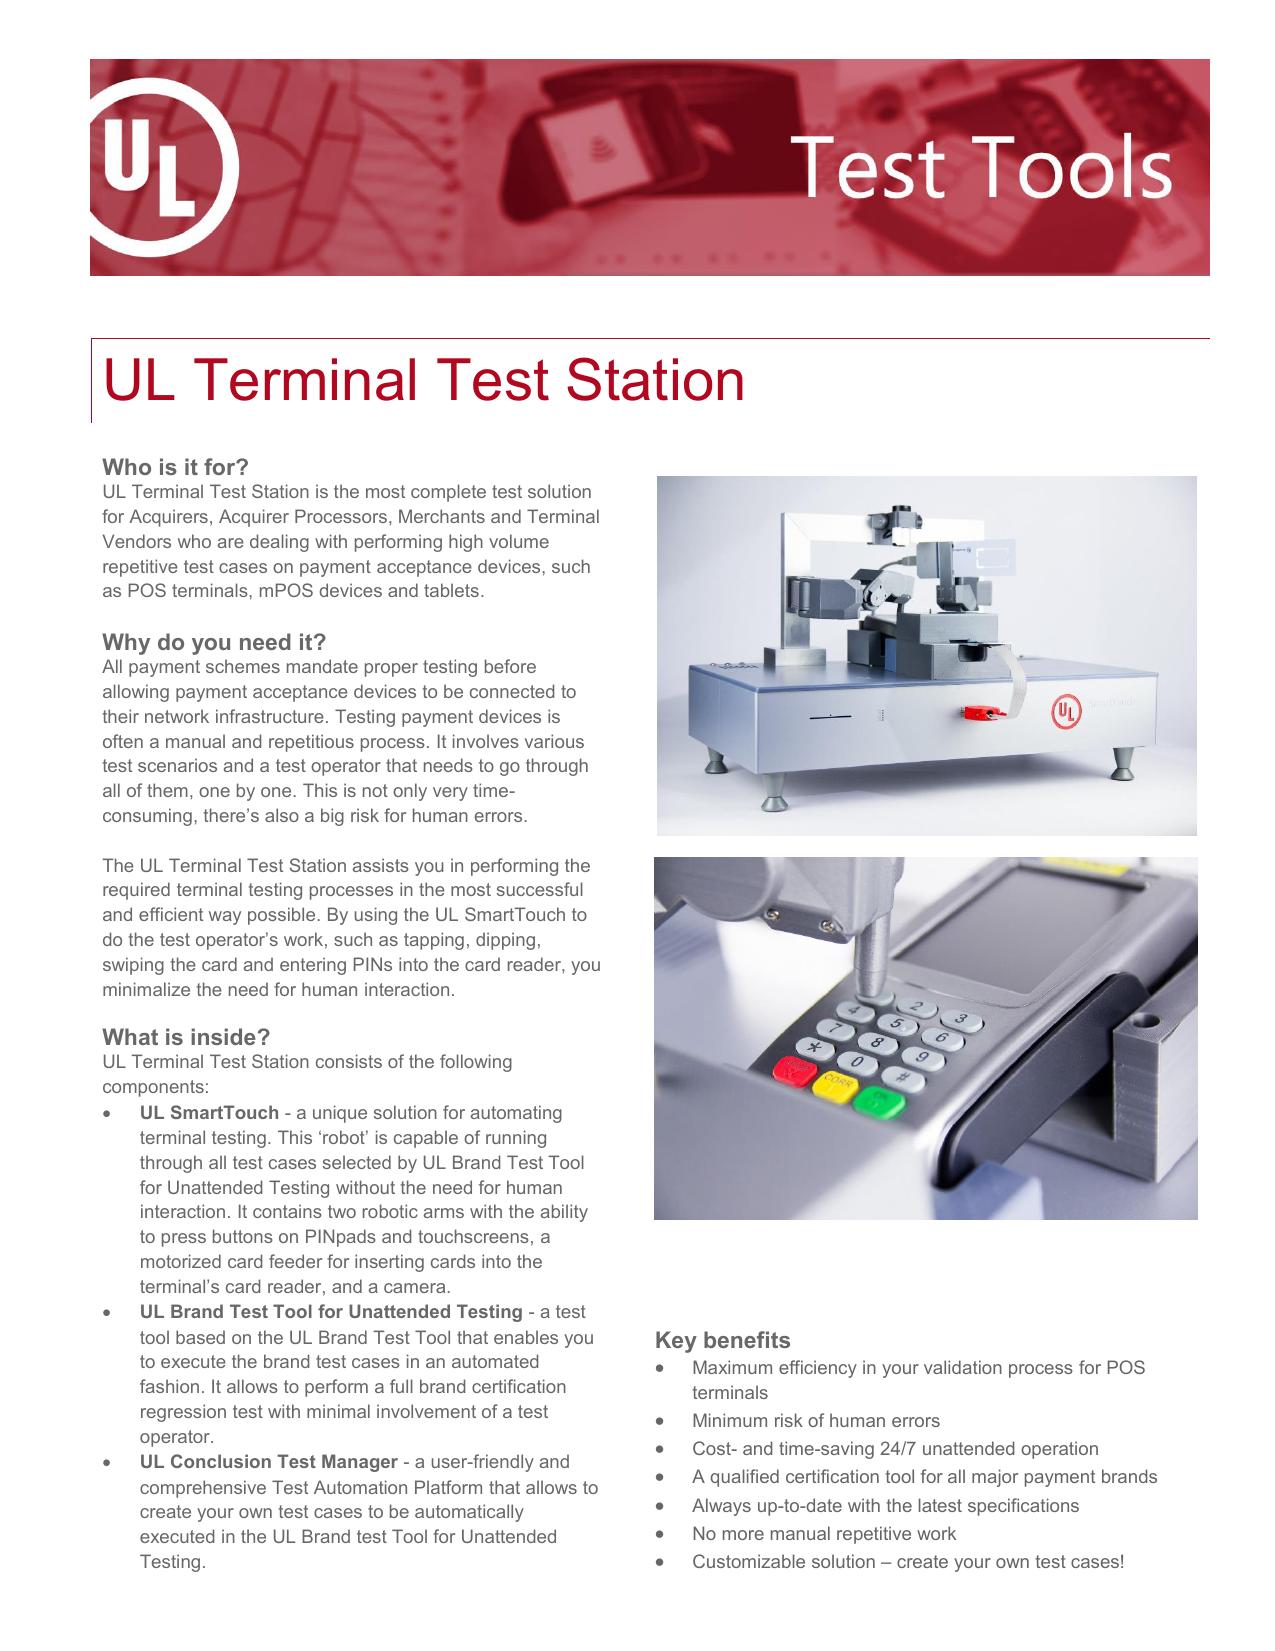 UL Terminal Test Station - UL Transaction Security | manualzz com